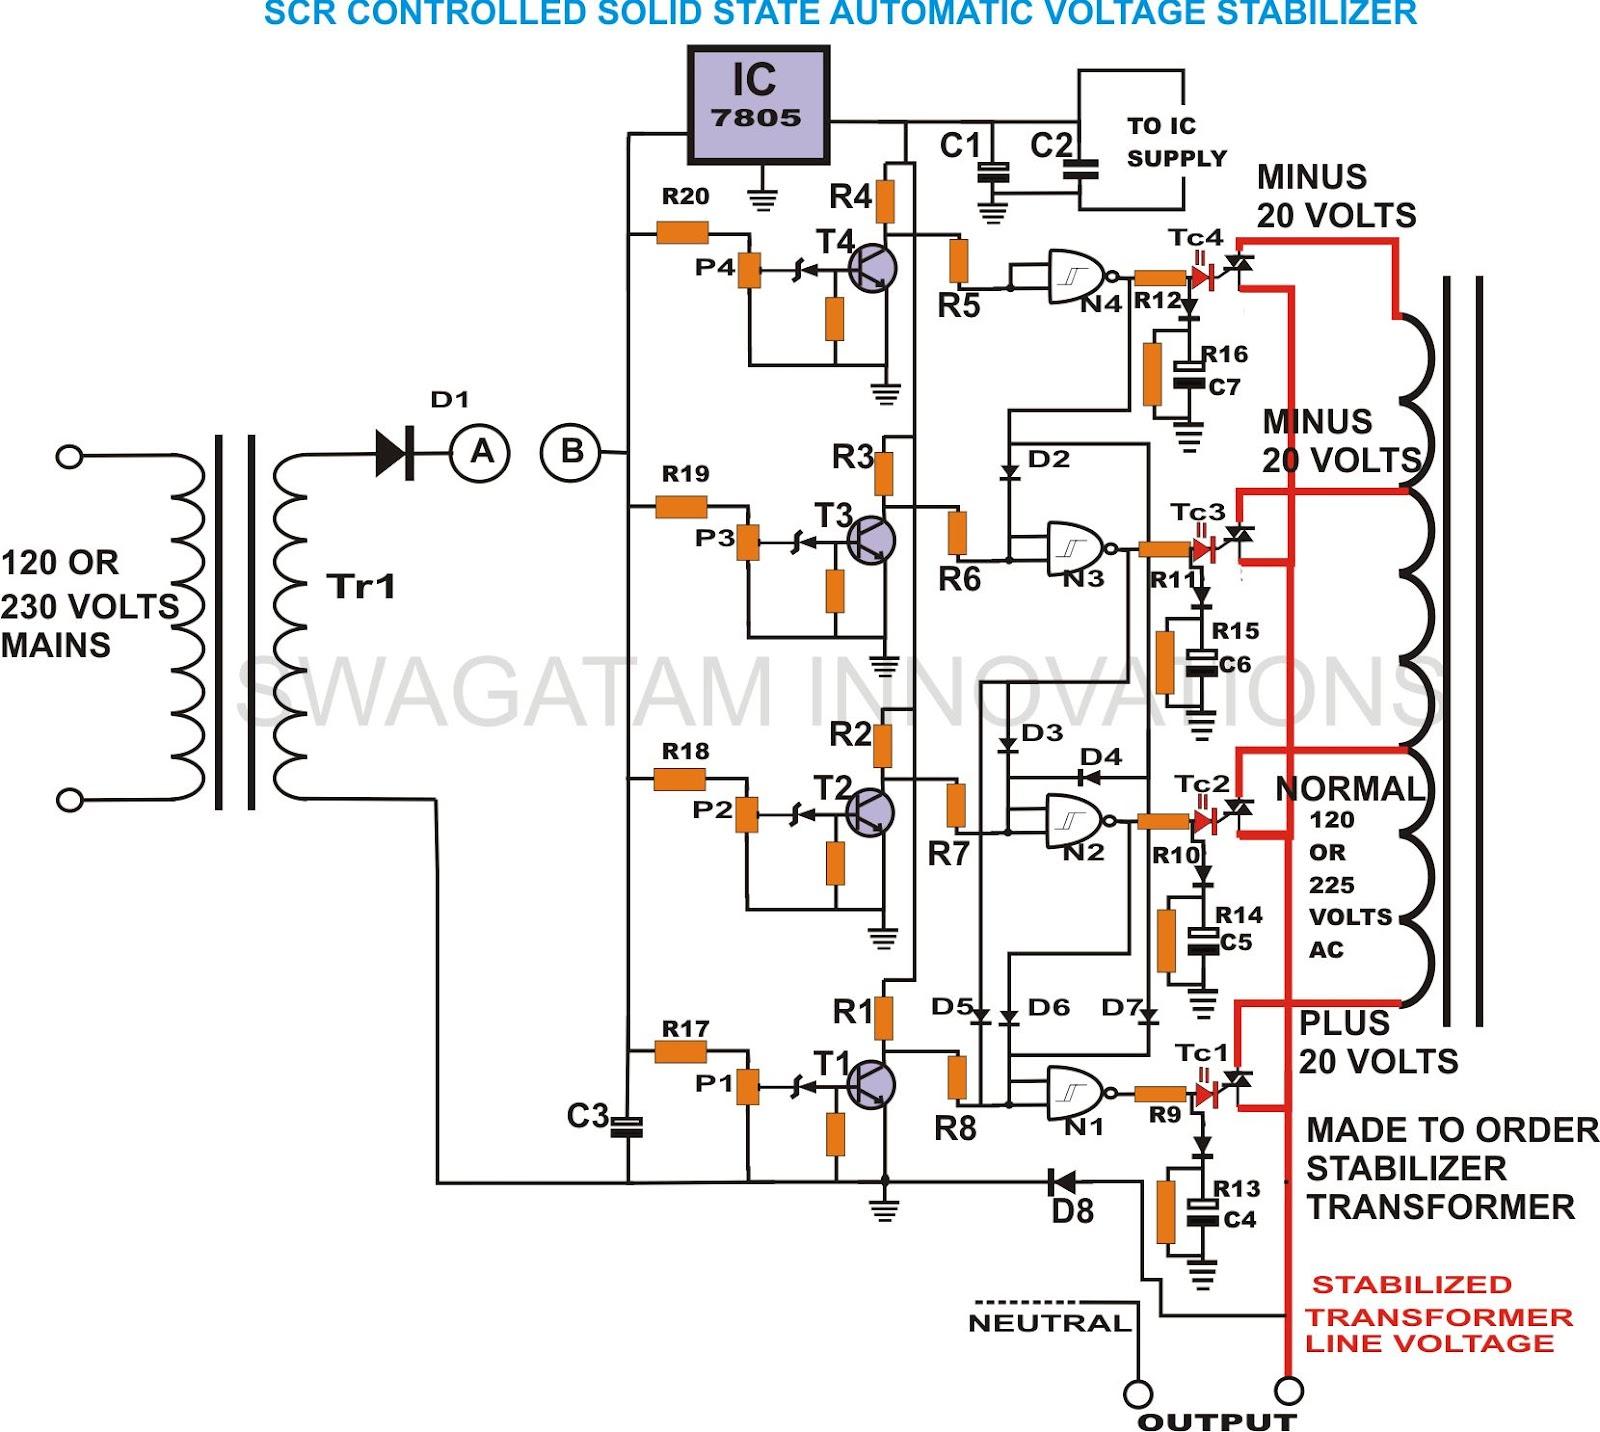 Triac Control Opto Circuit Ac Stabilizer Controlled Automatic Voltage 1600x1432